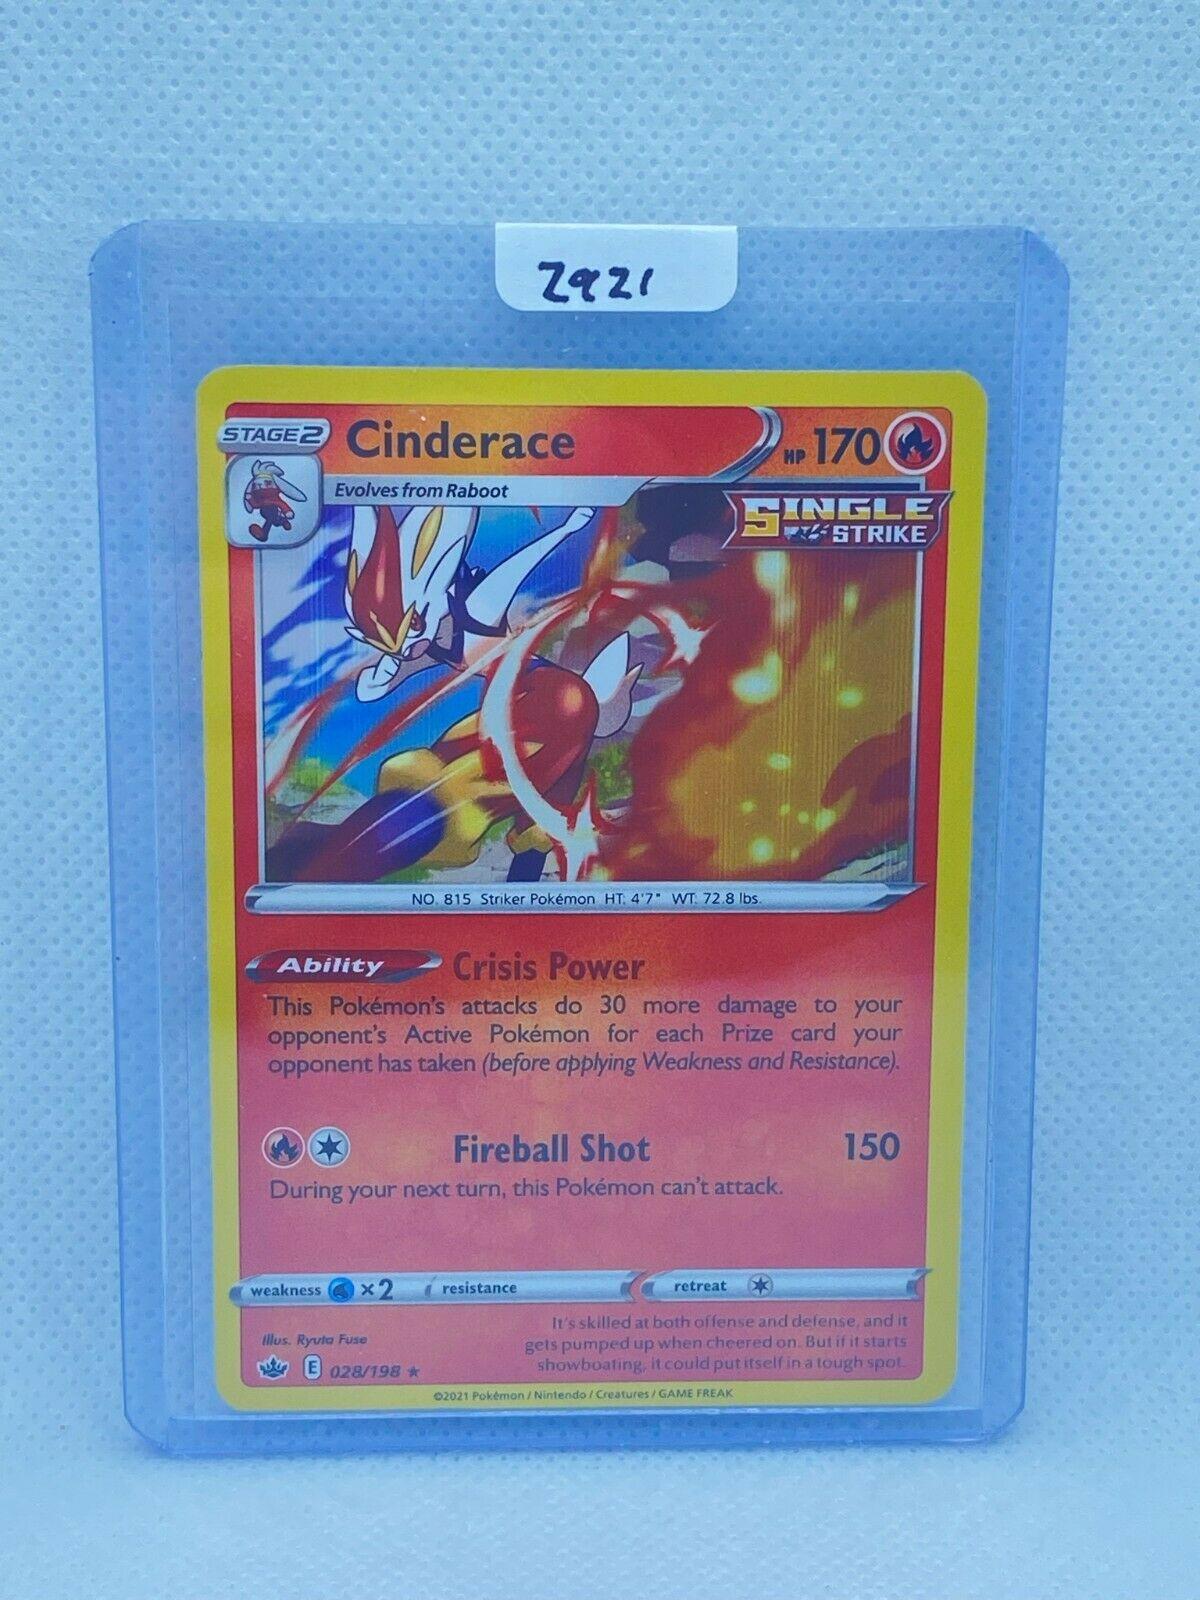 Pokémon TCG Cinderace Holo 028/198 | Chilling Reign | Play/Grade Ready